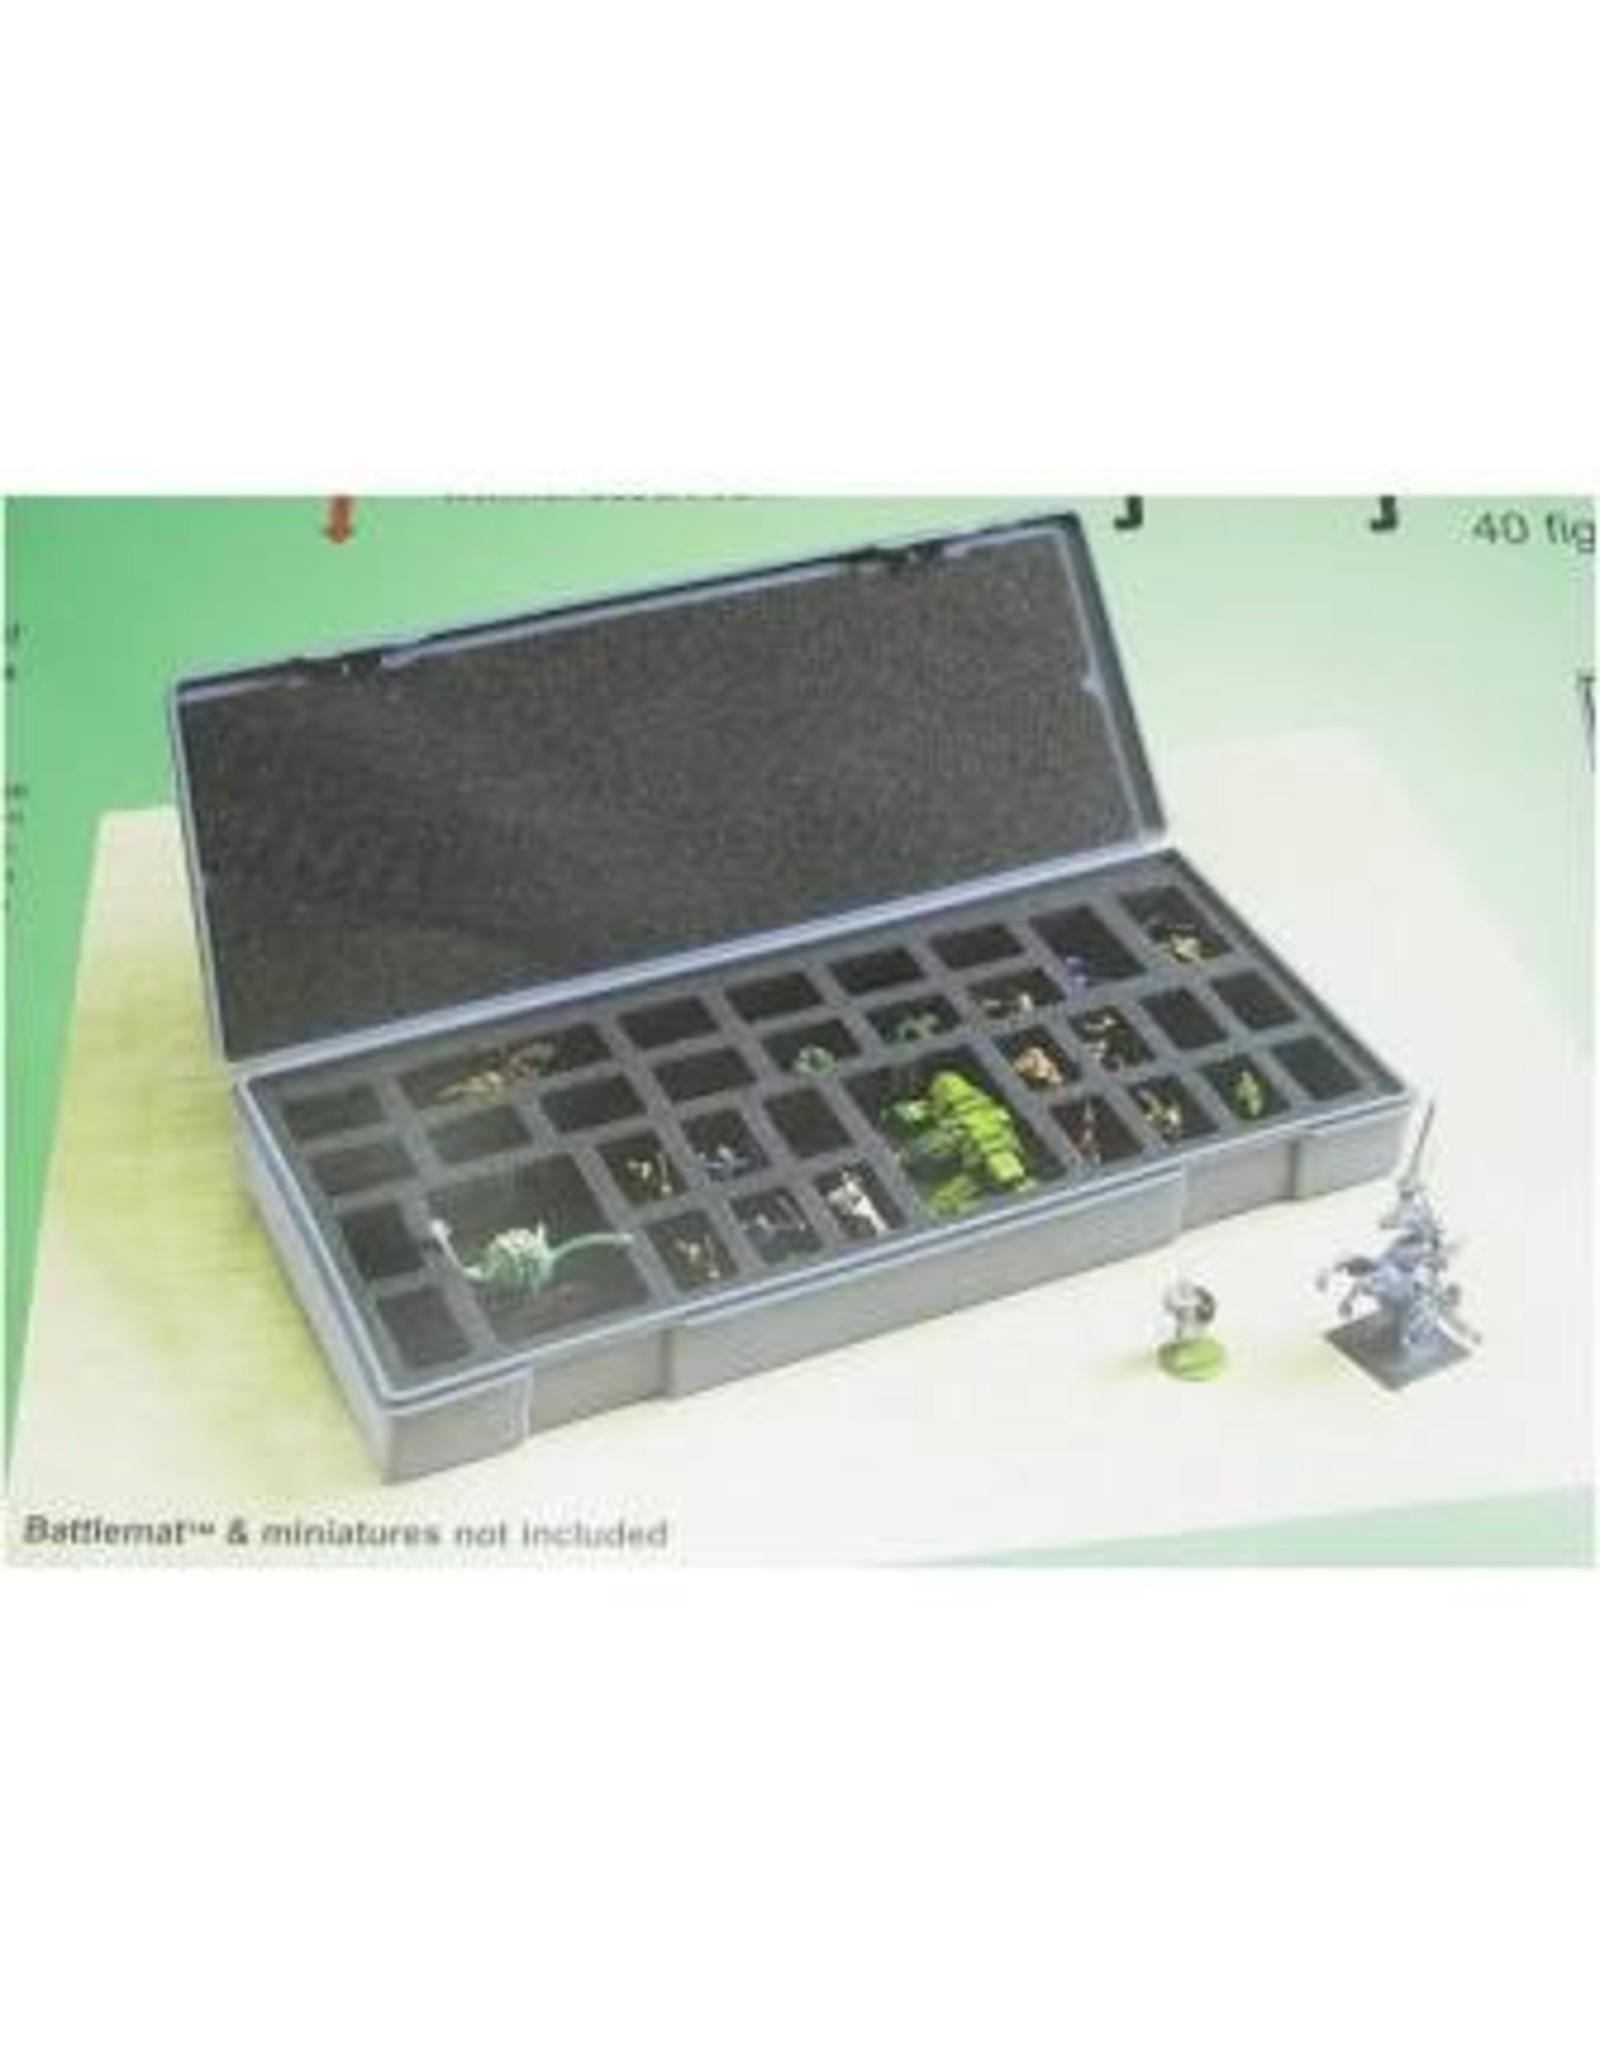 Chessex Figure Storage Box 40 figures